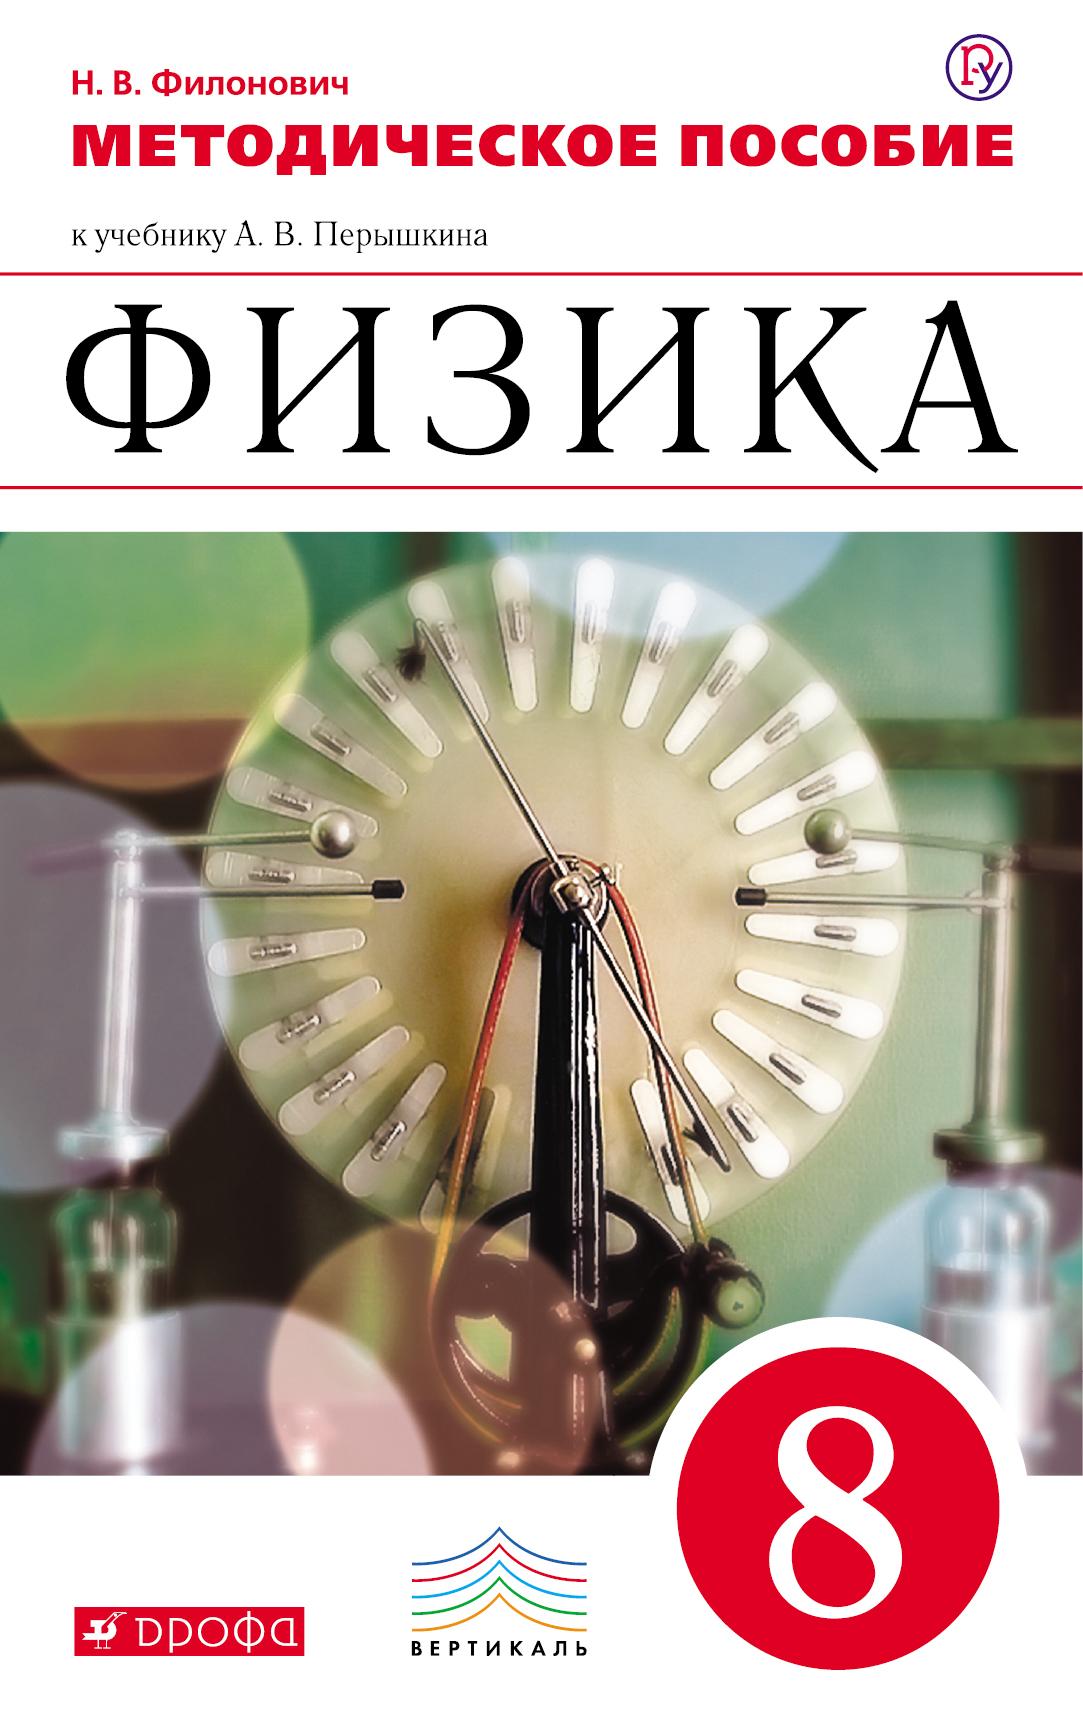 Филонович Н.В. Физика. 8 класс. Методическое пособие филонович н в физика 7 класс методическое пособие